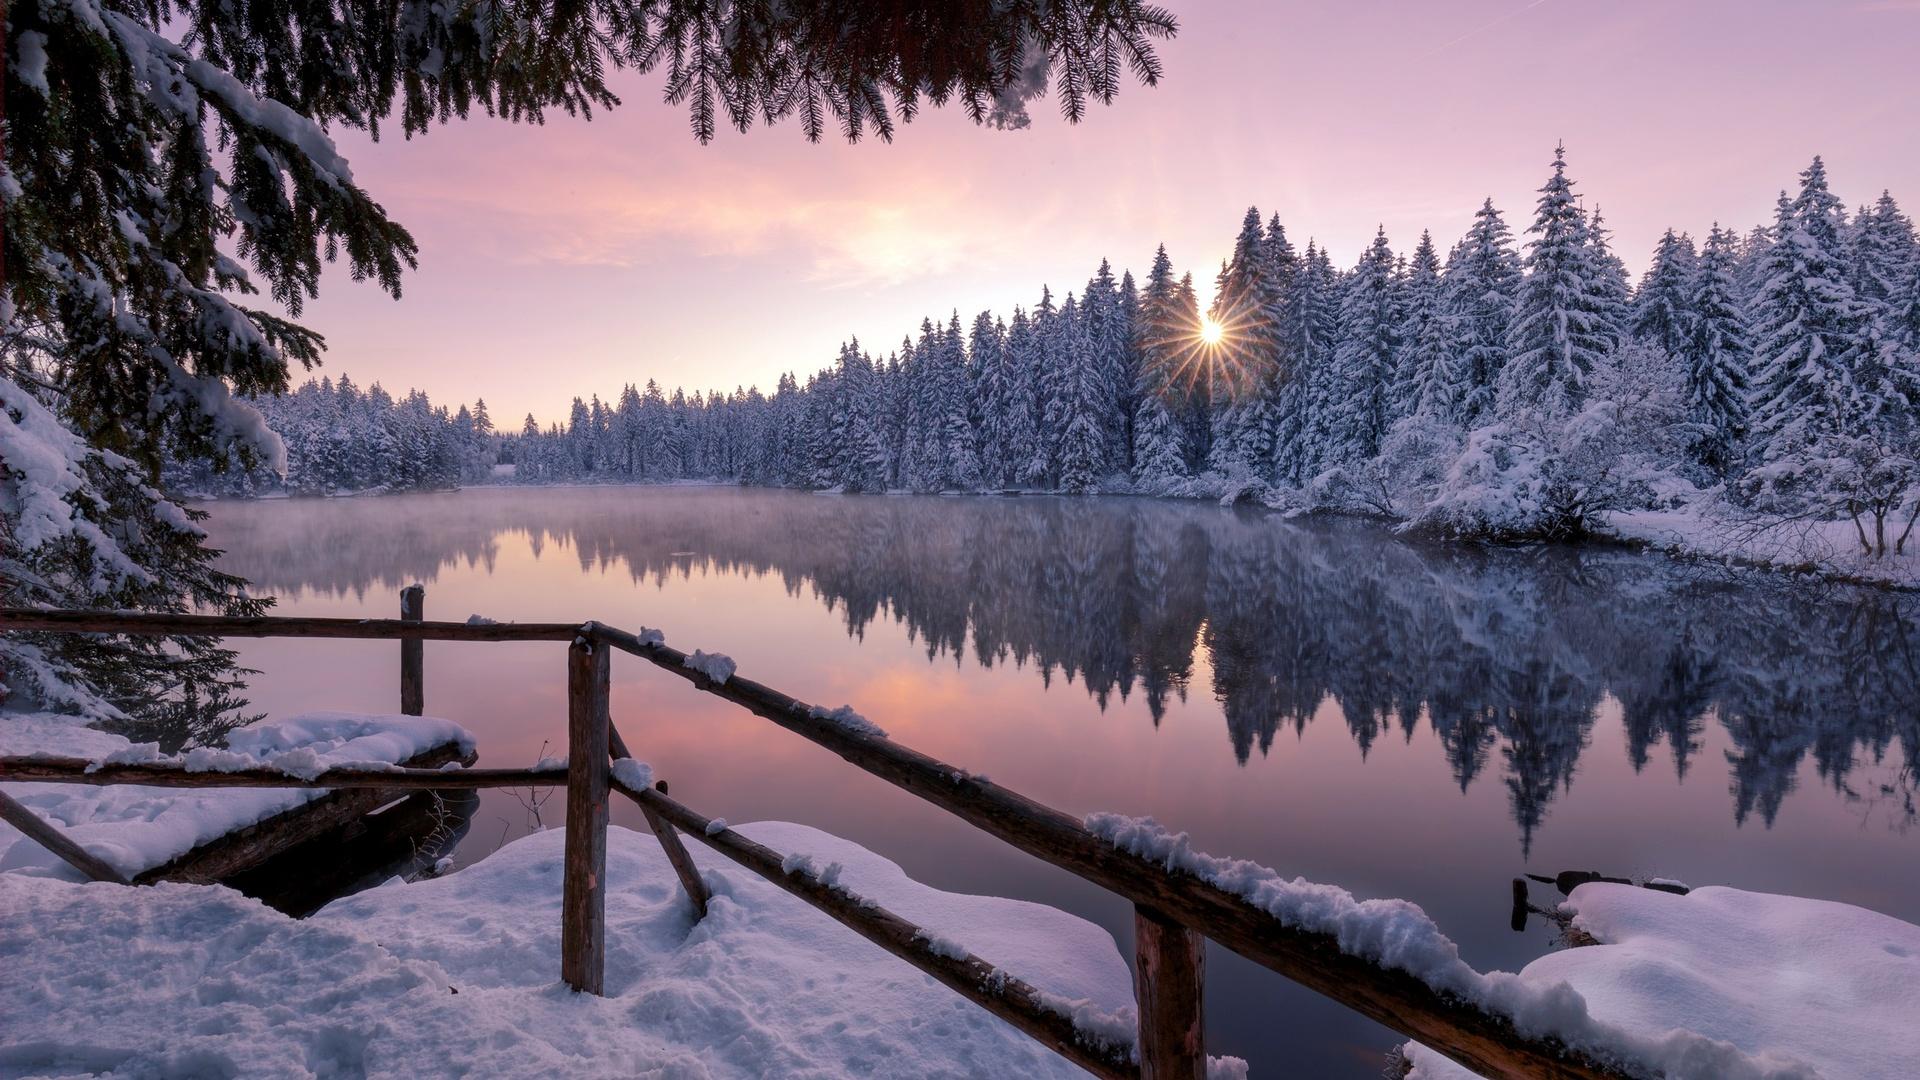 Winter Wallpaper Nature Snow